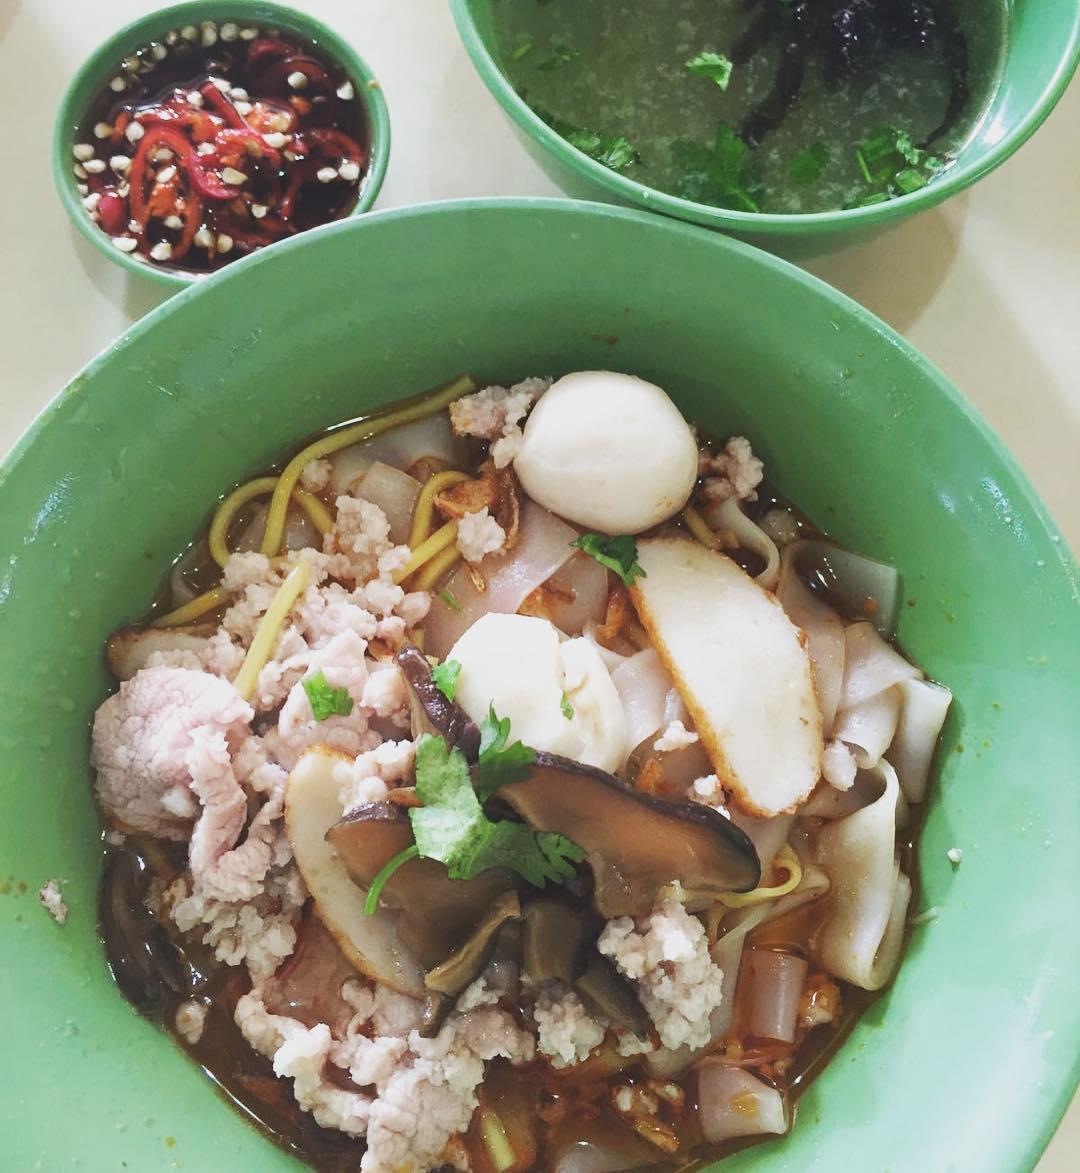 pek kio food centre - Bak Chor Mee